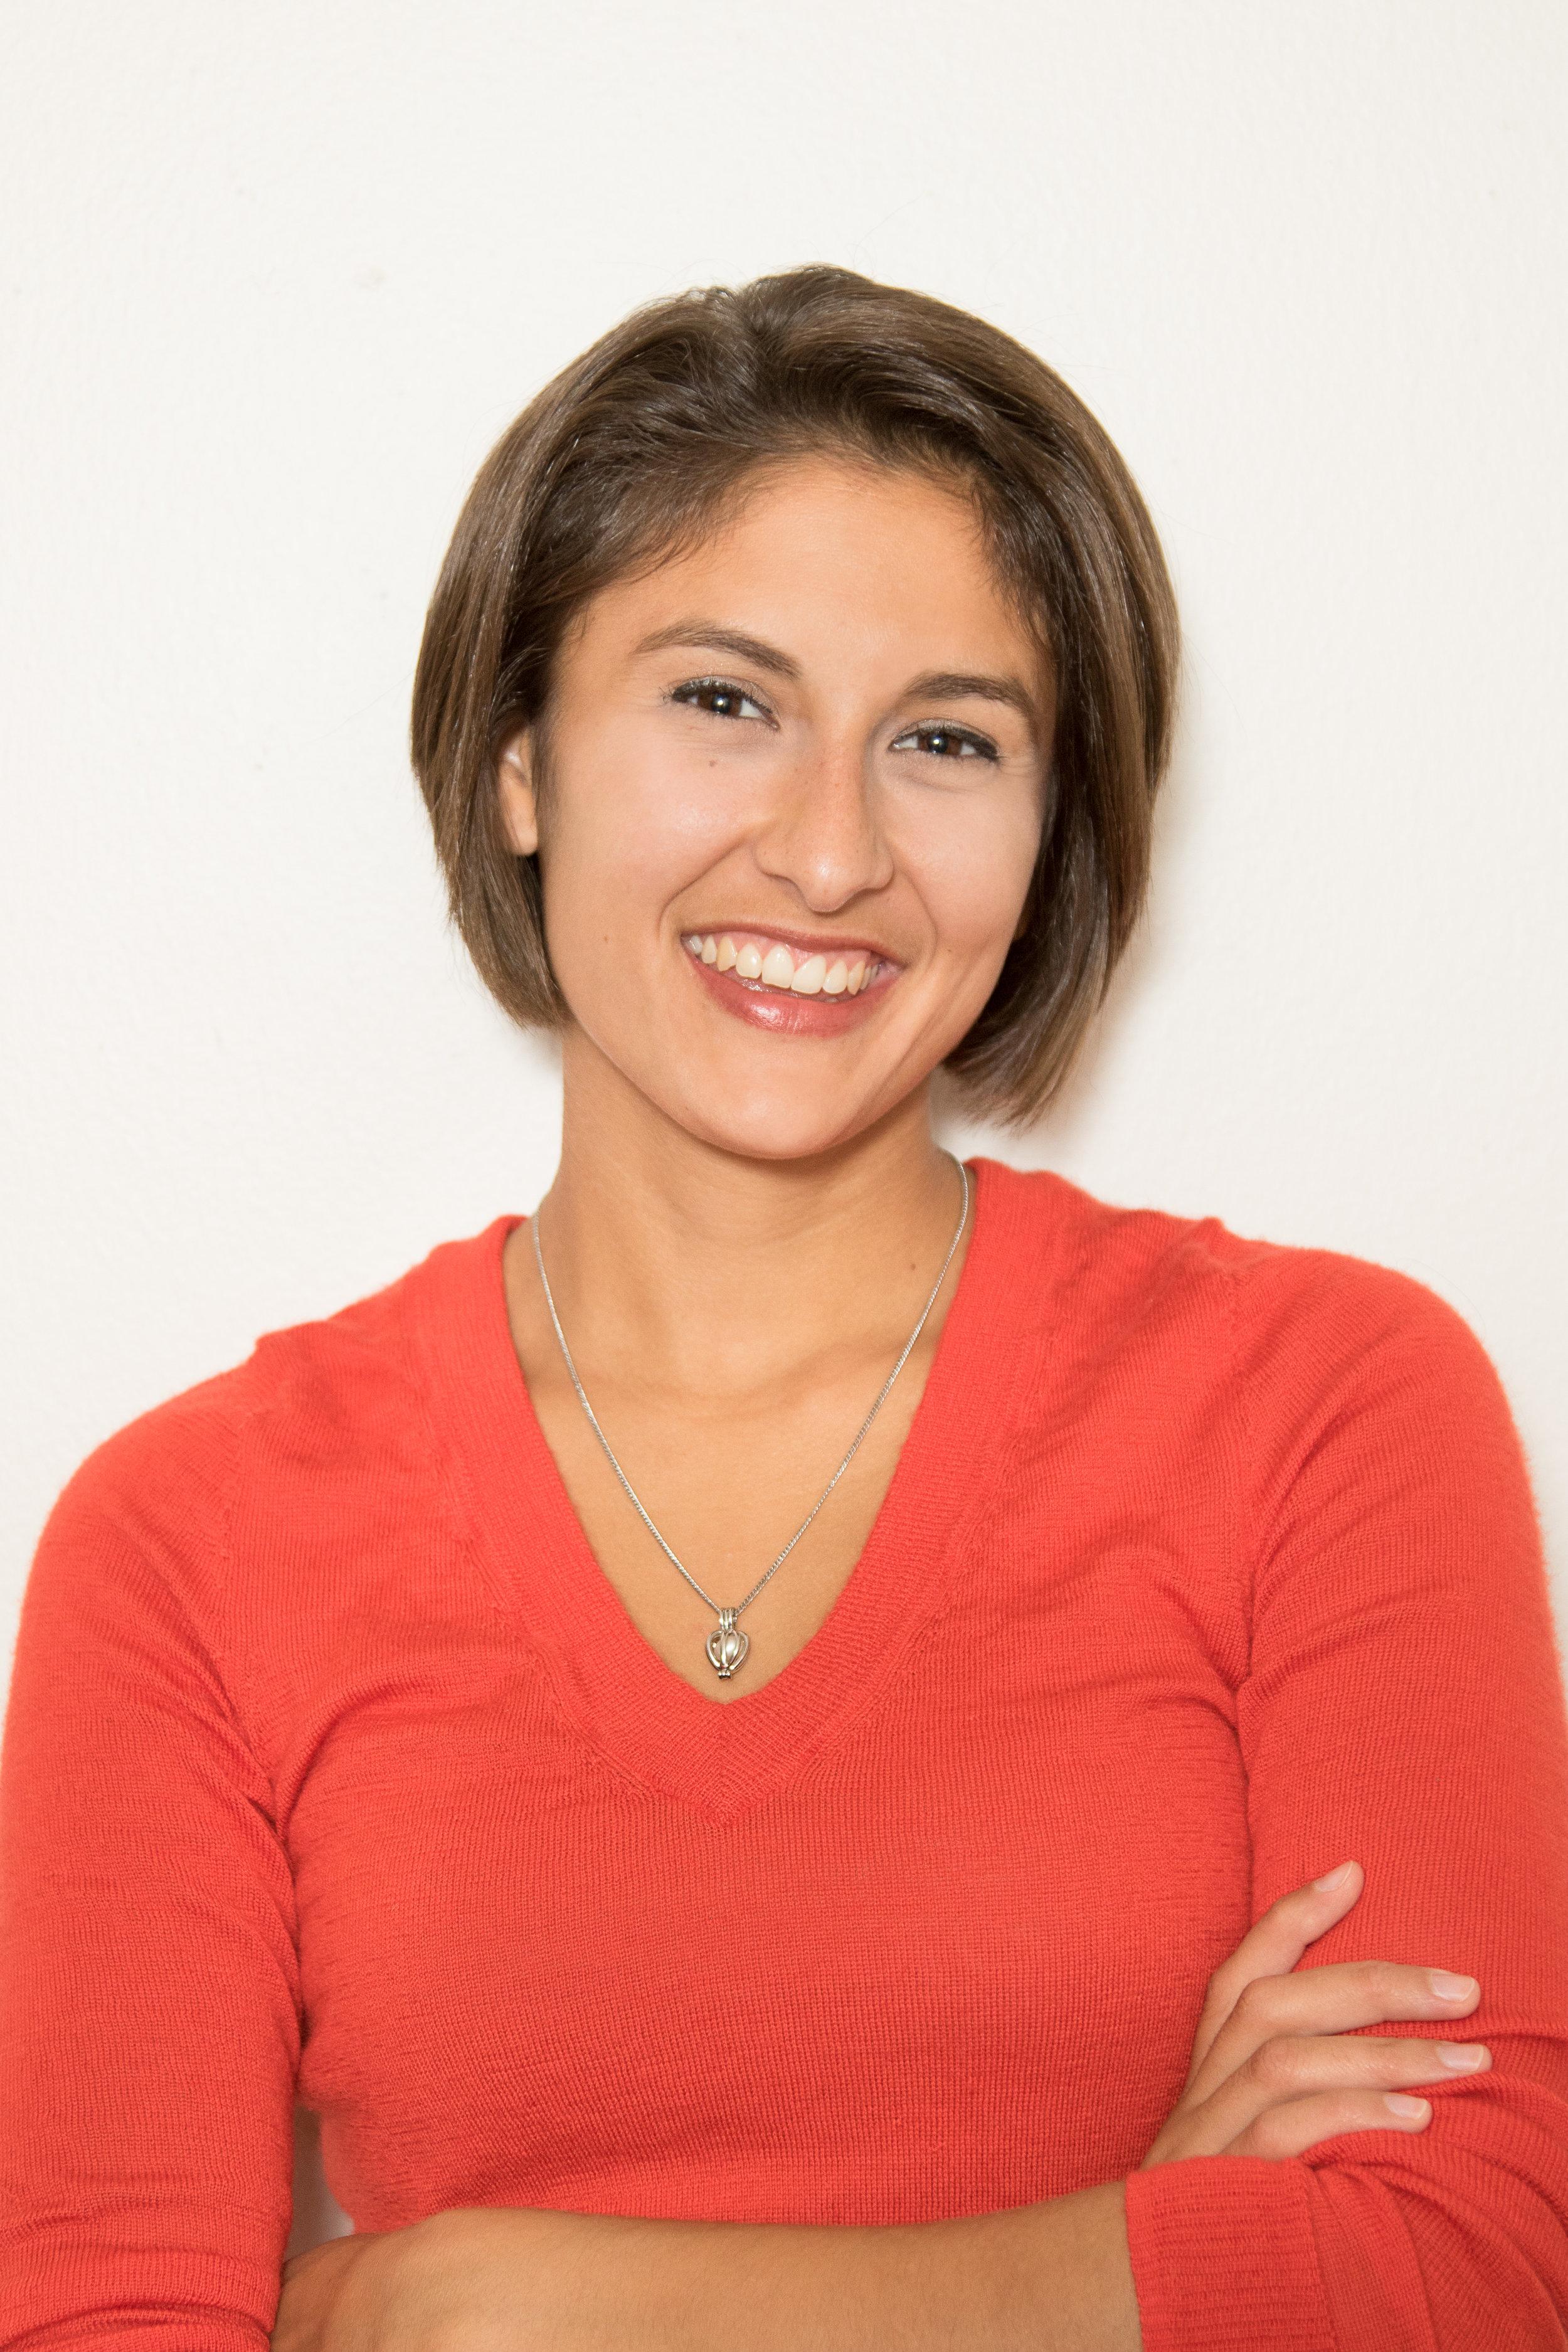 Amanda Muschlitz Stayton,  Owner & Head Photographer